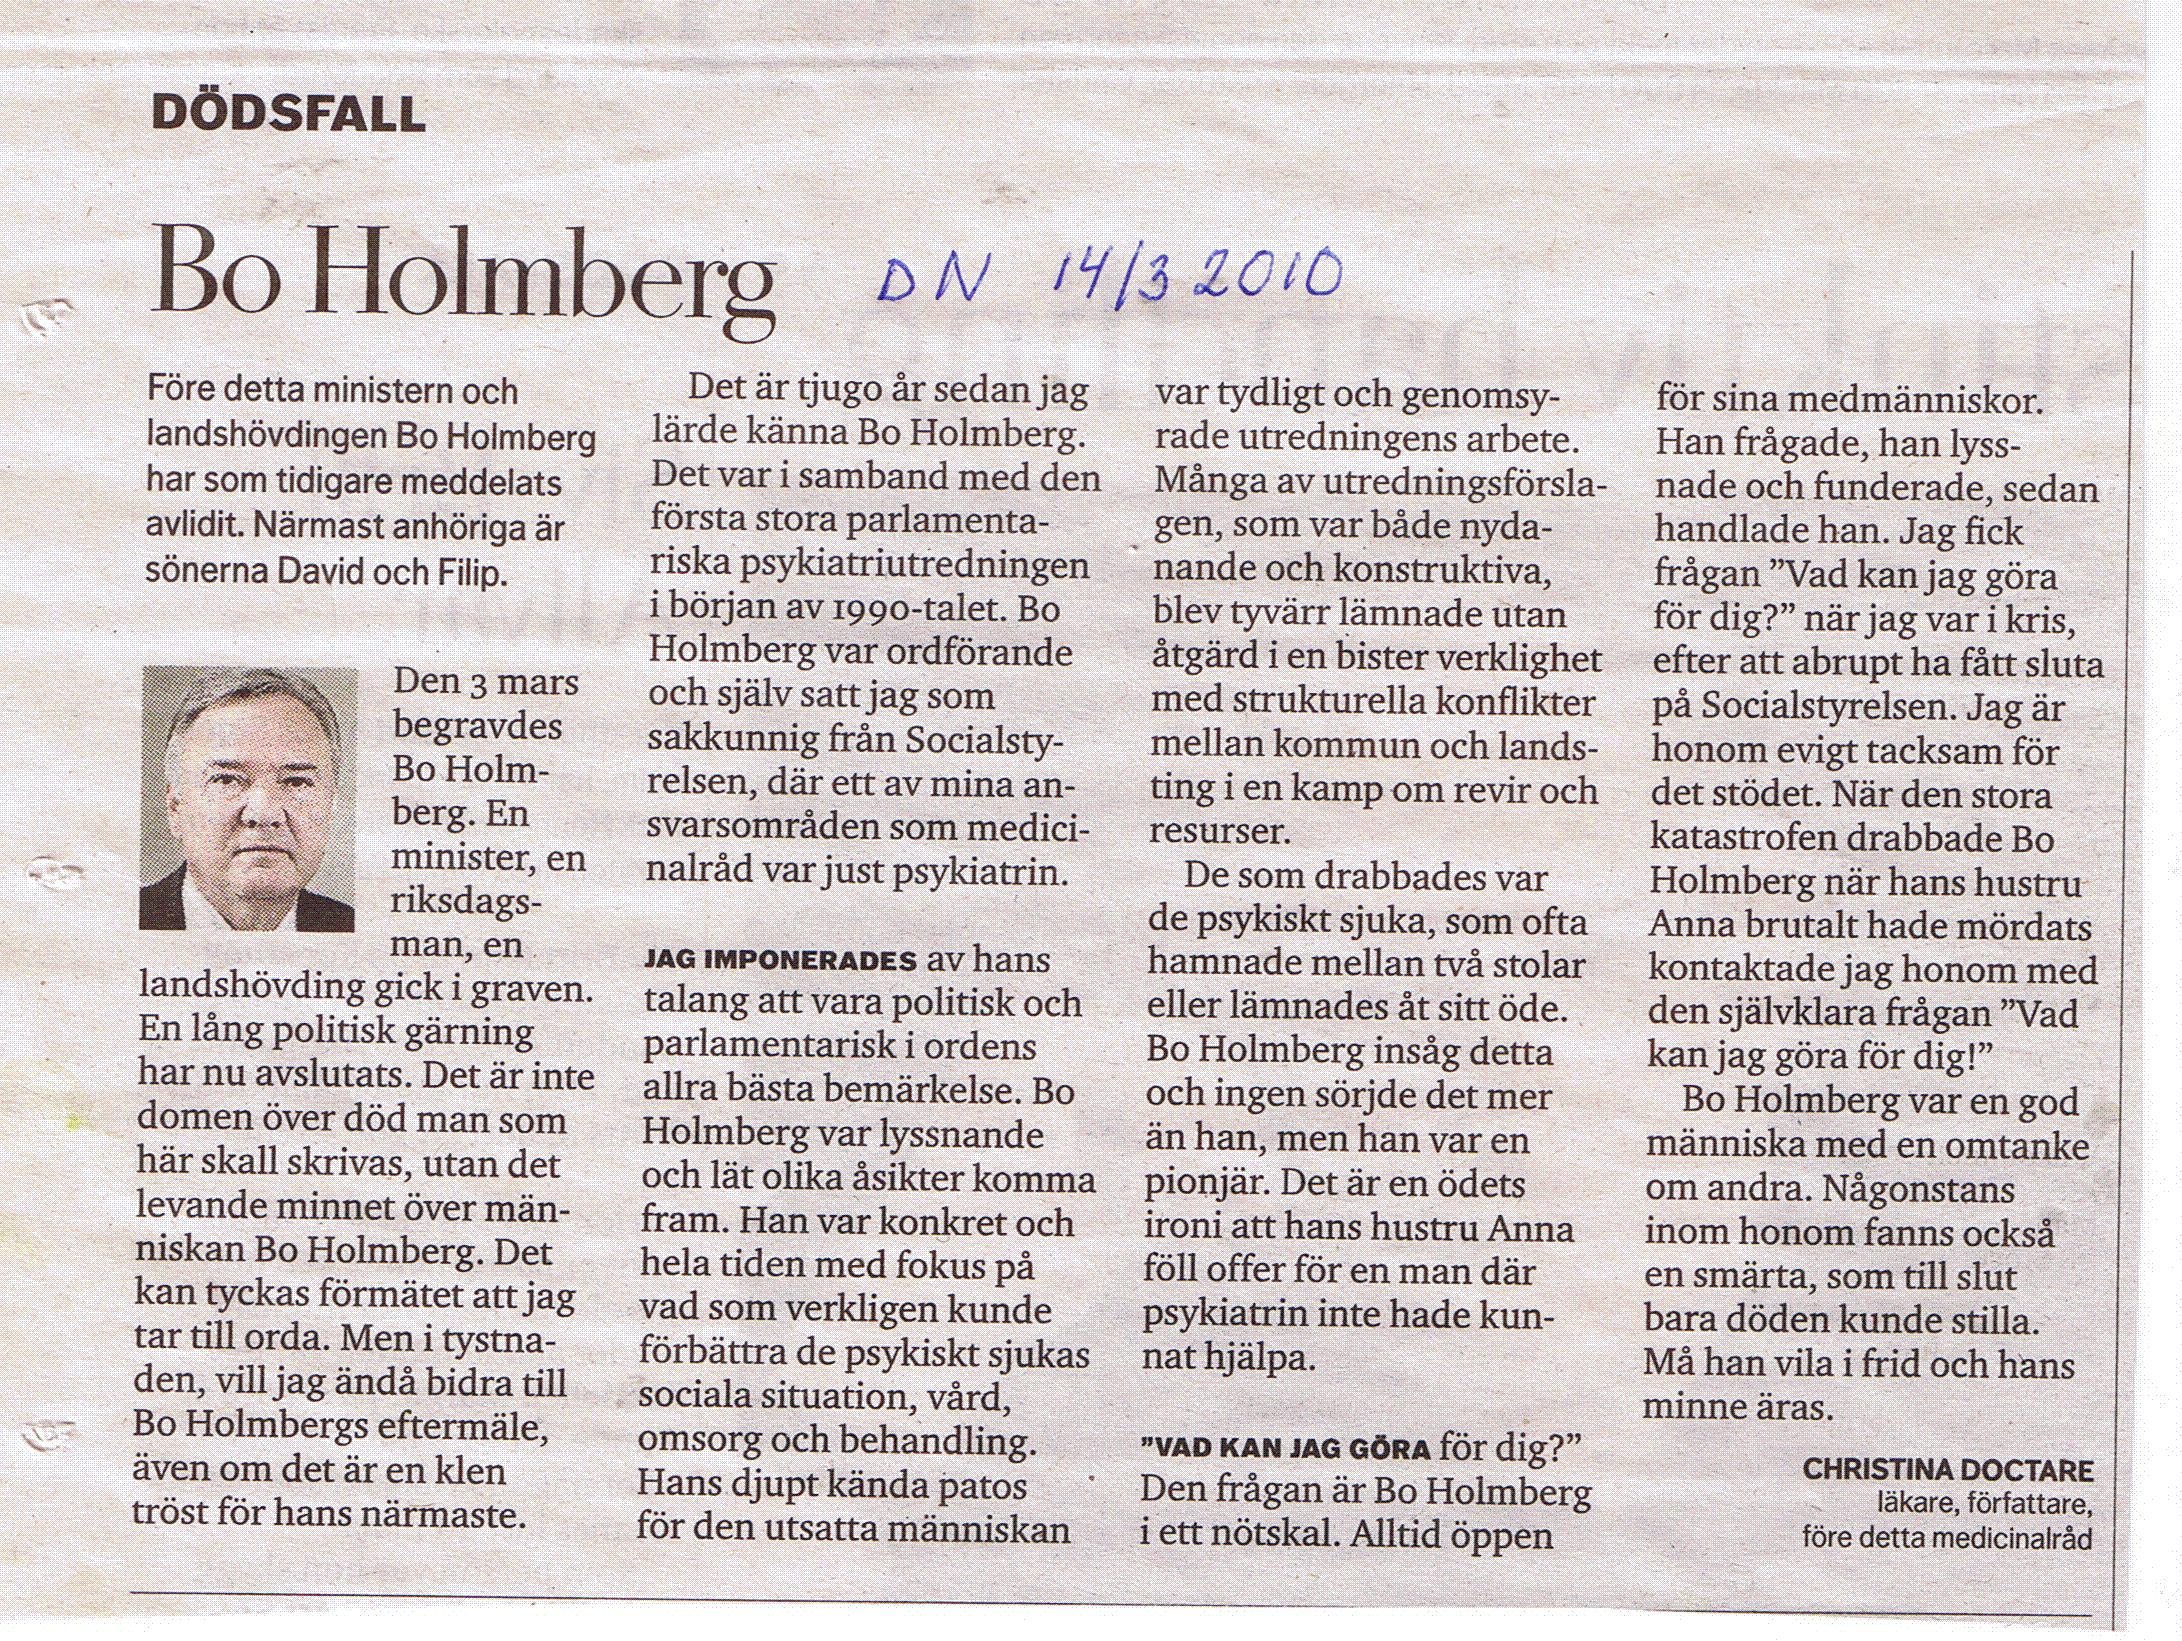 Bo holmberg dod